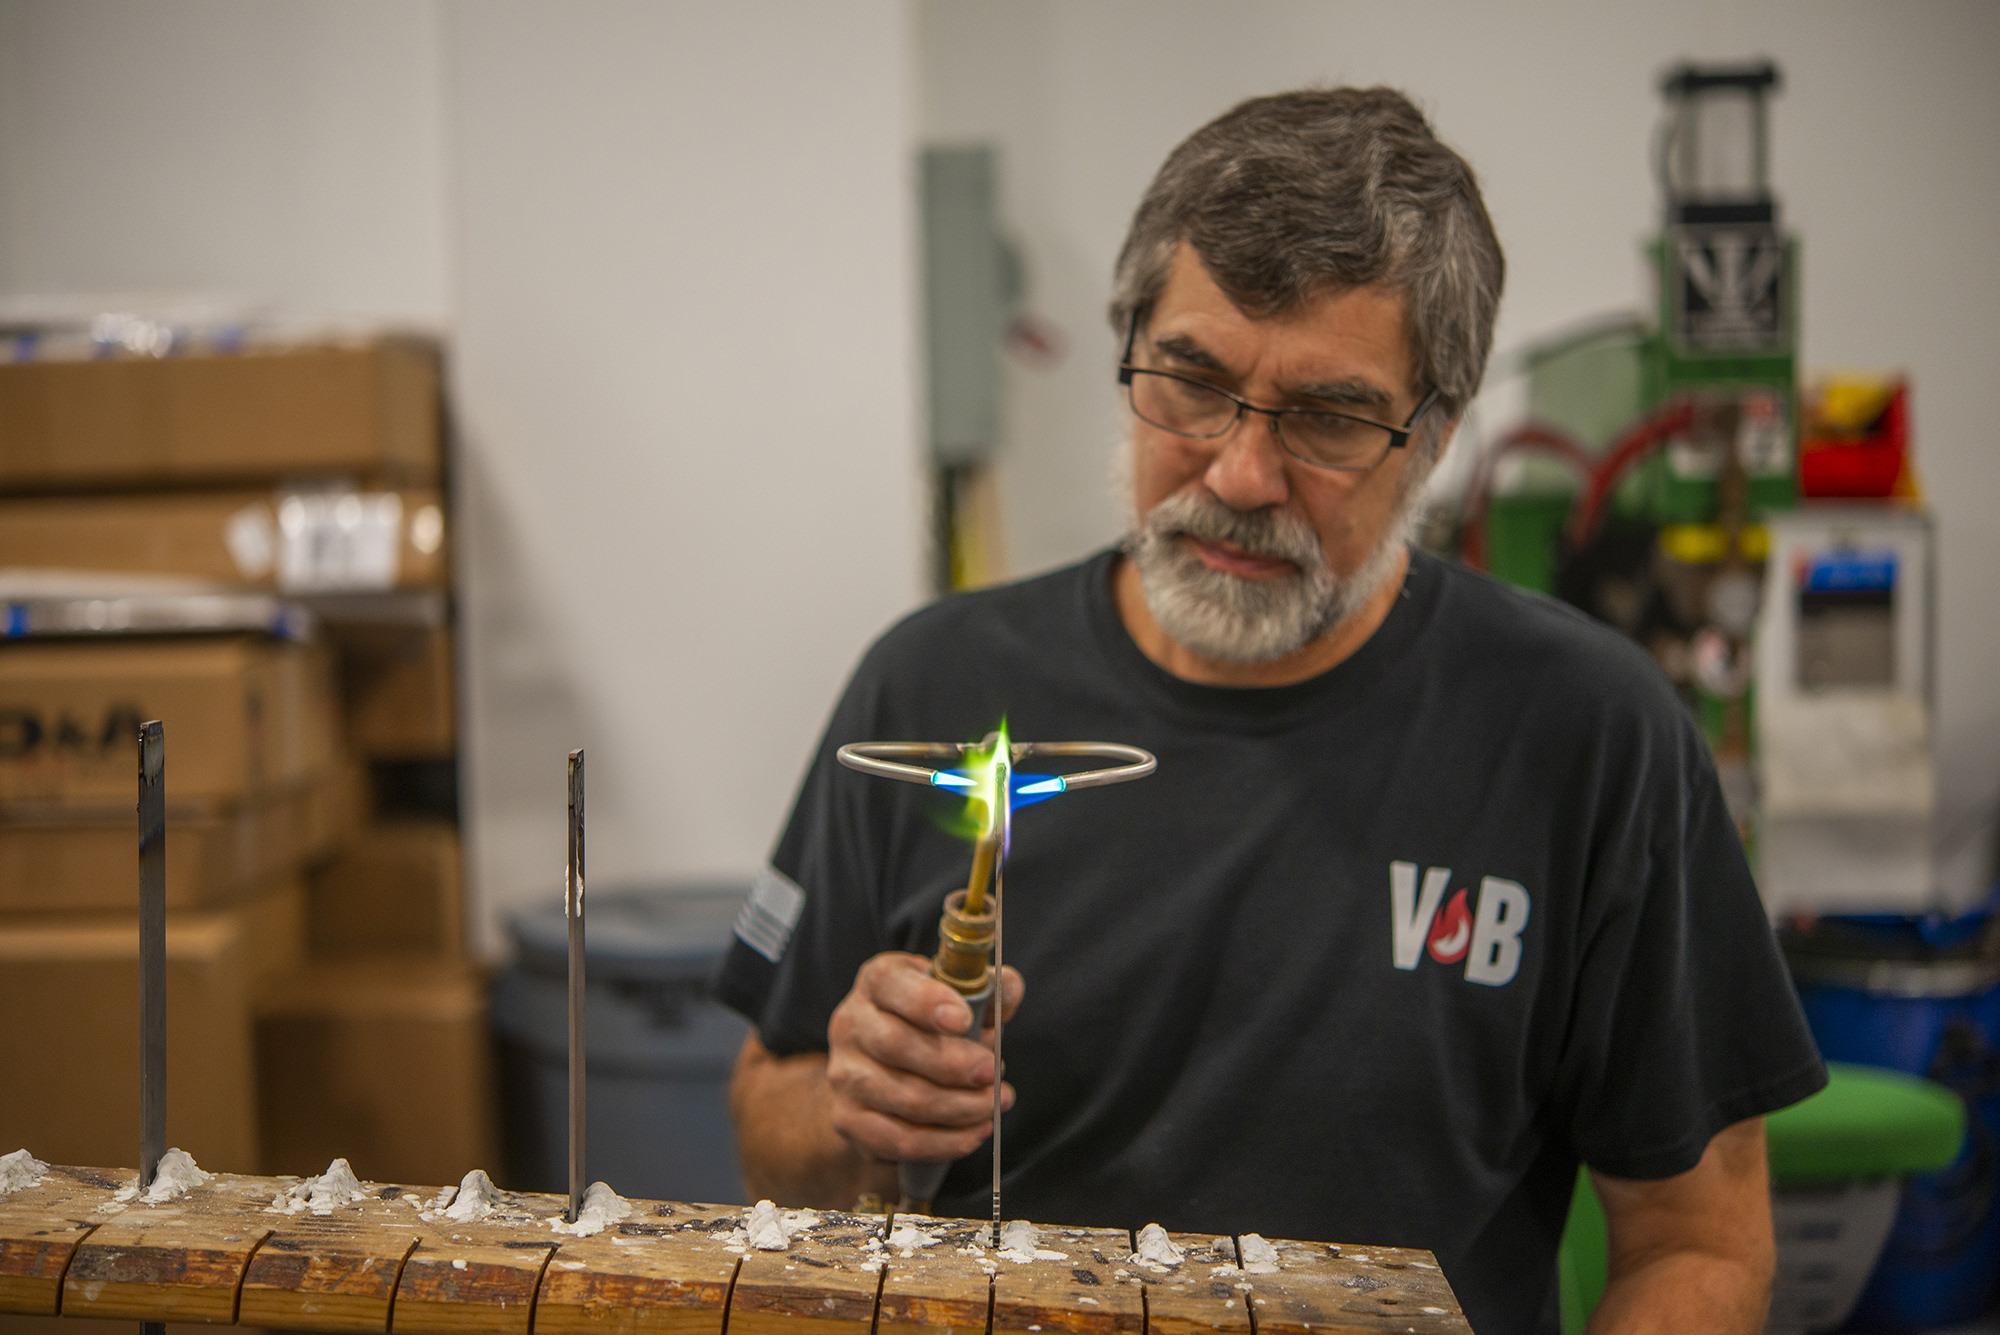 Vacu Braze team member uses torch brazing